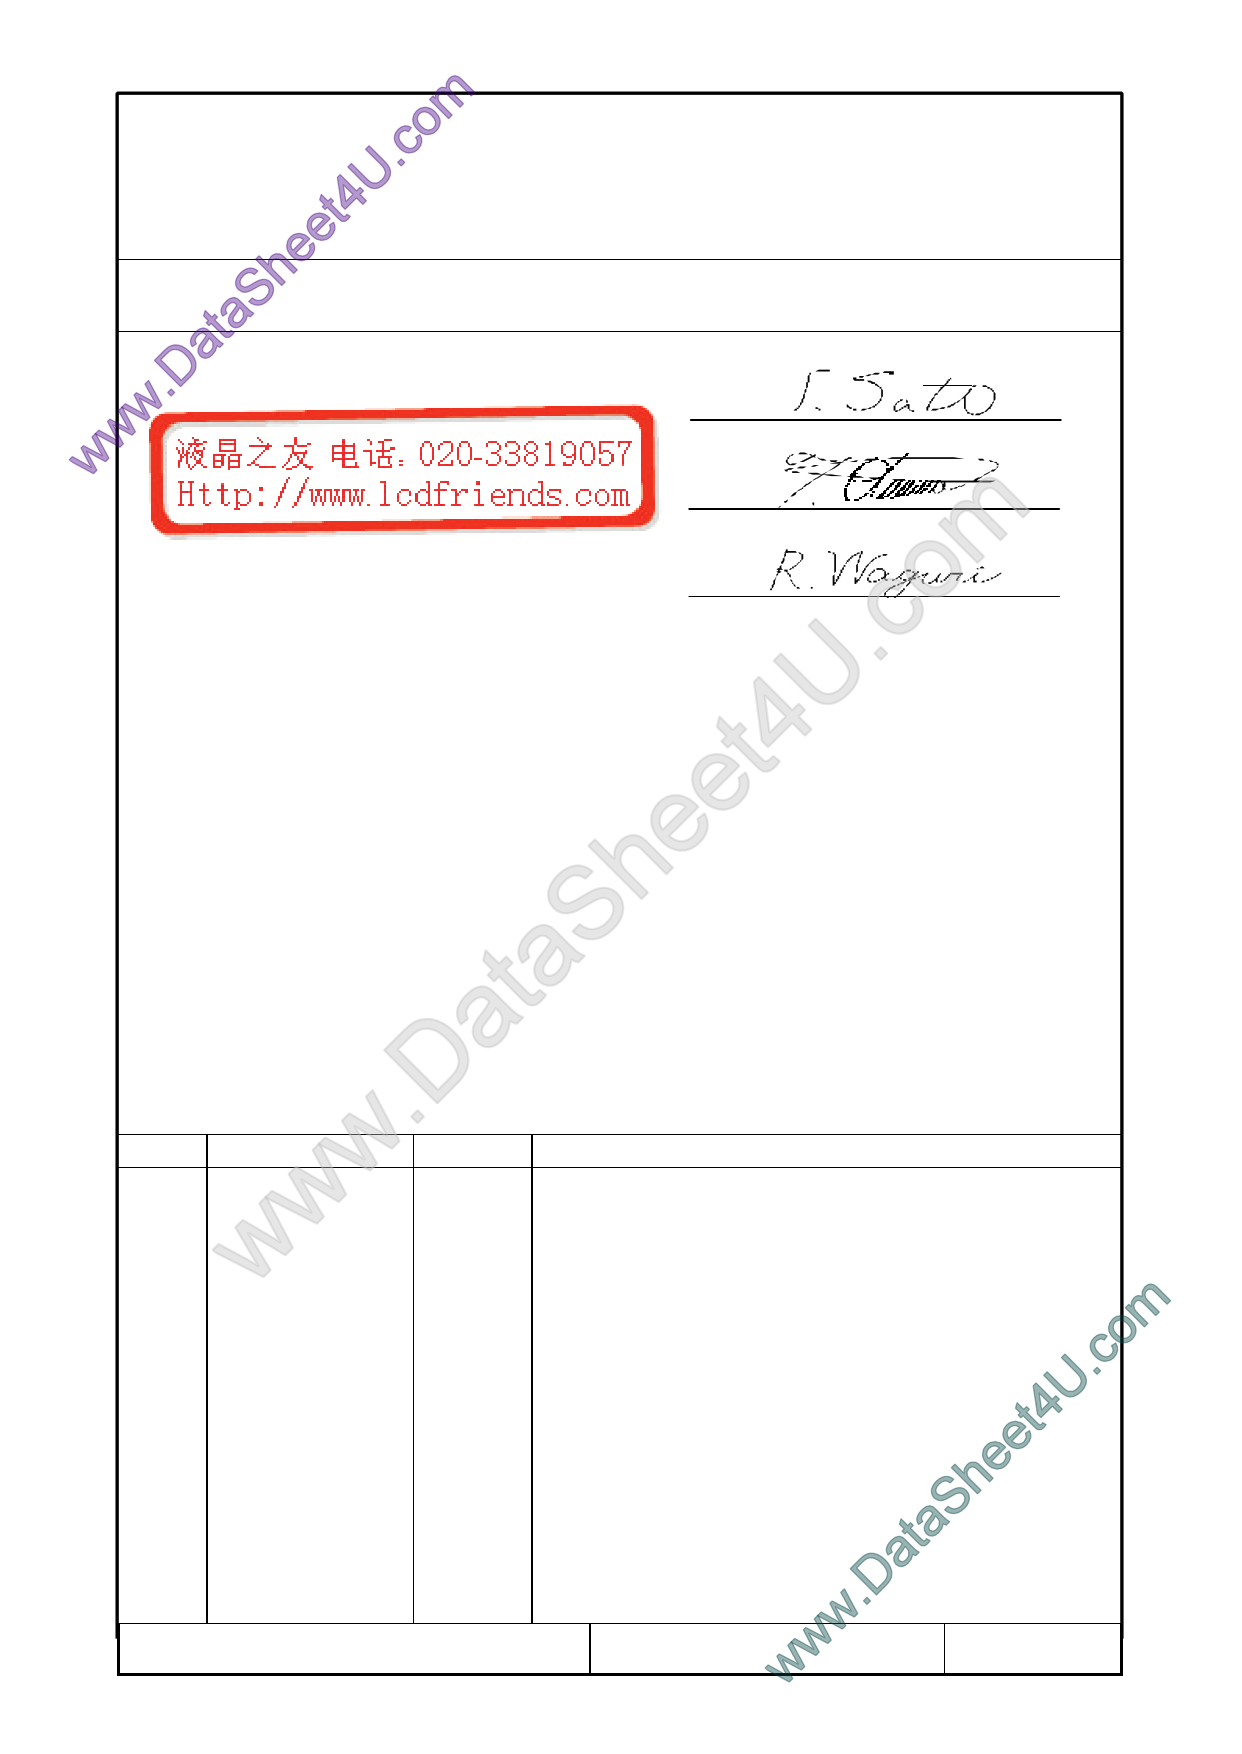 F-51477GNB-FW-AD datasheet